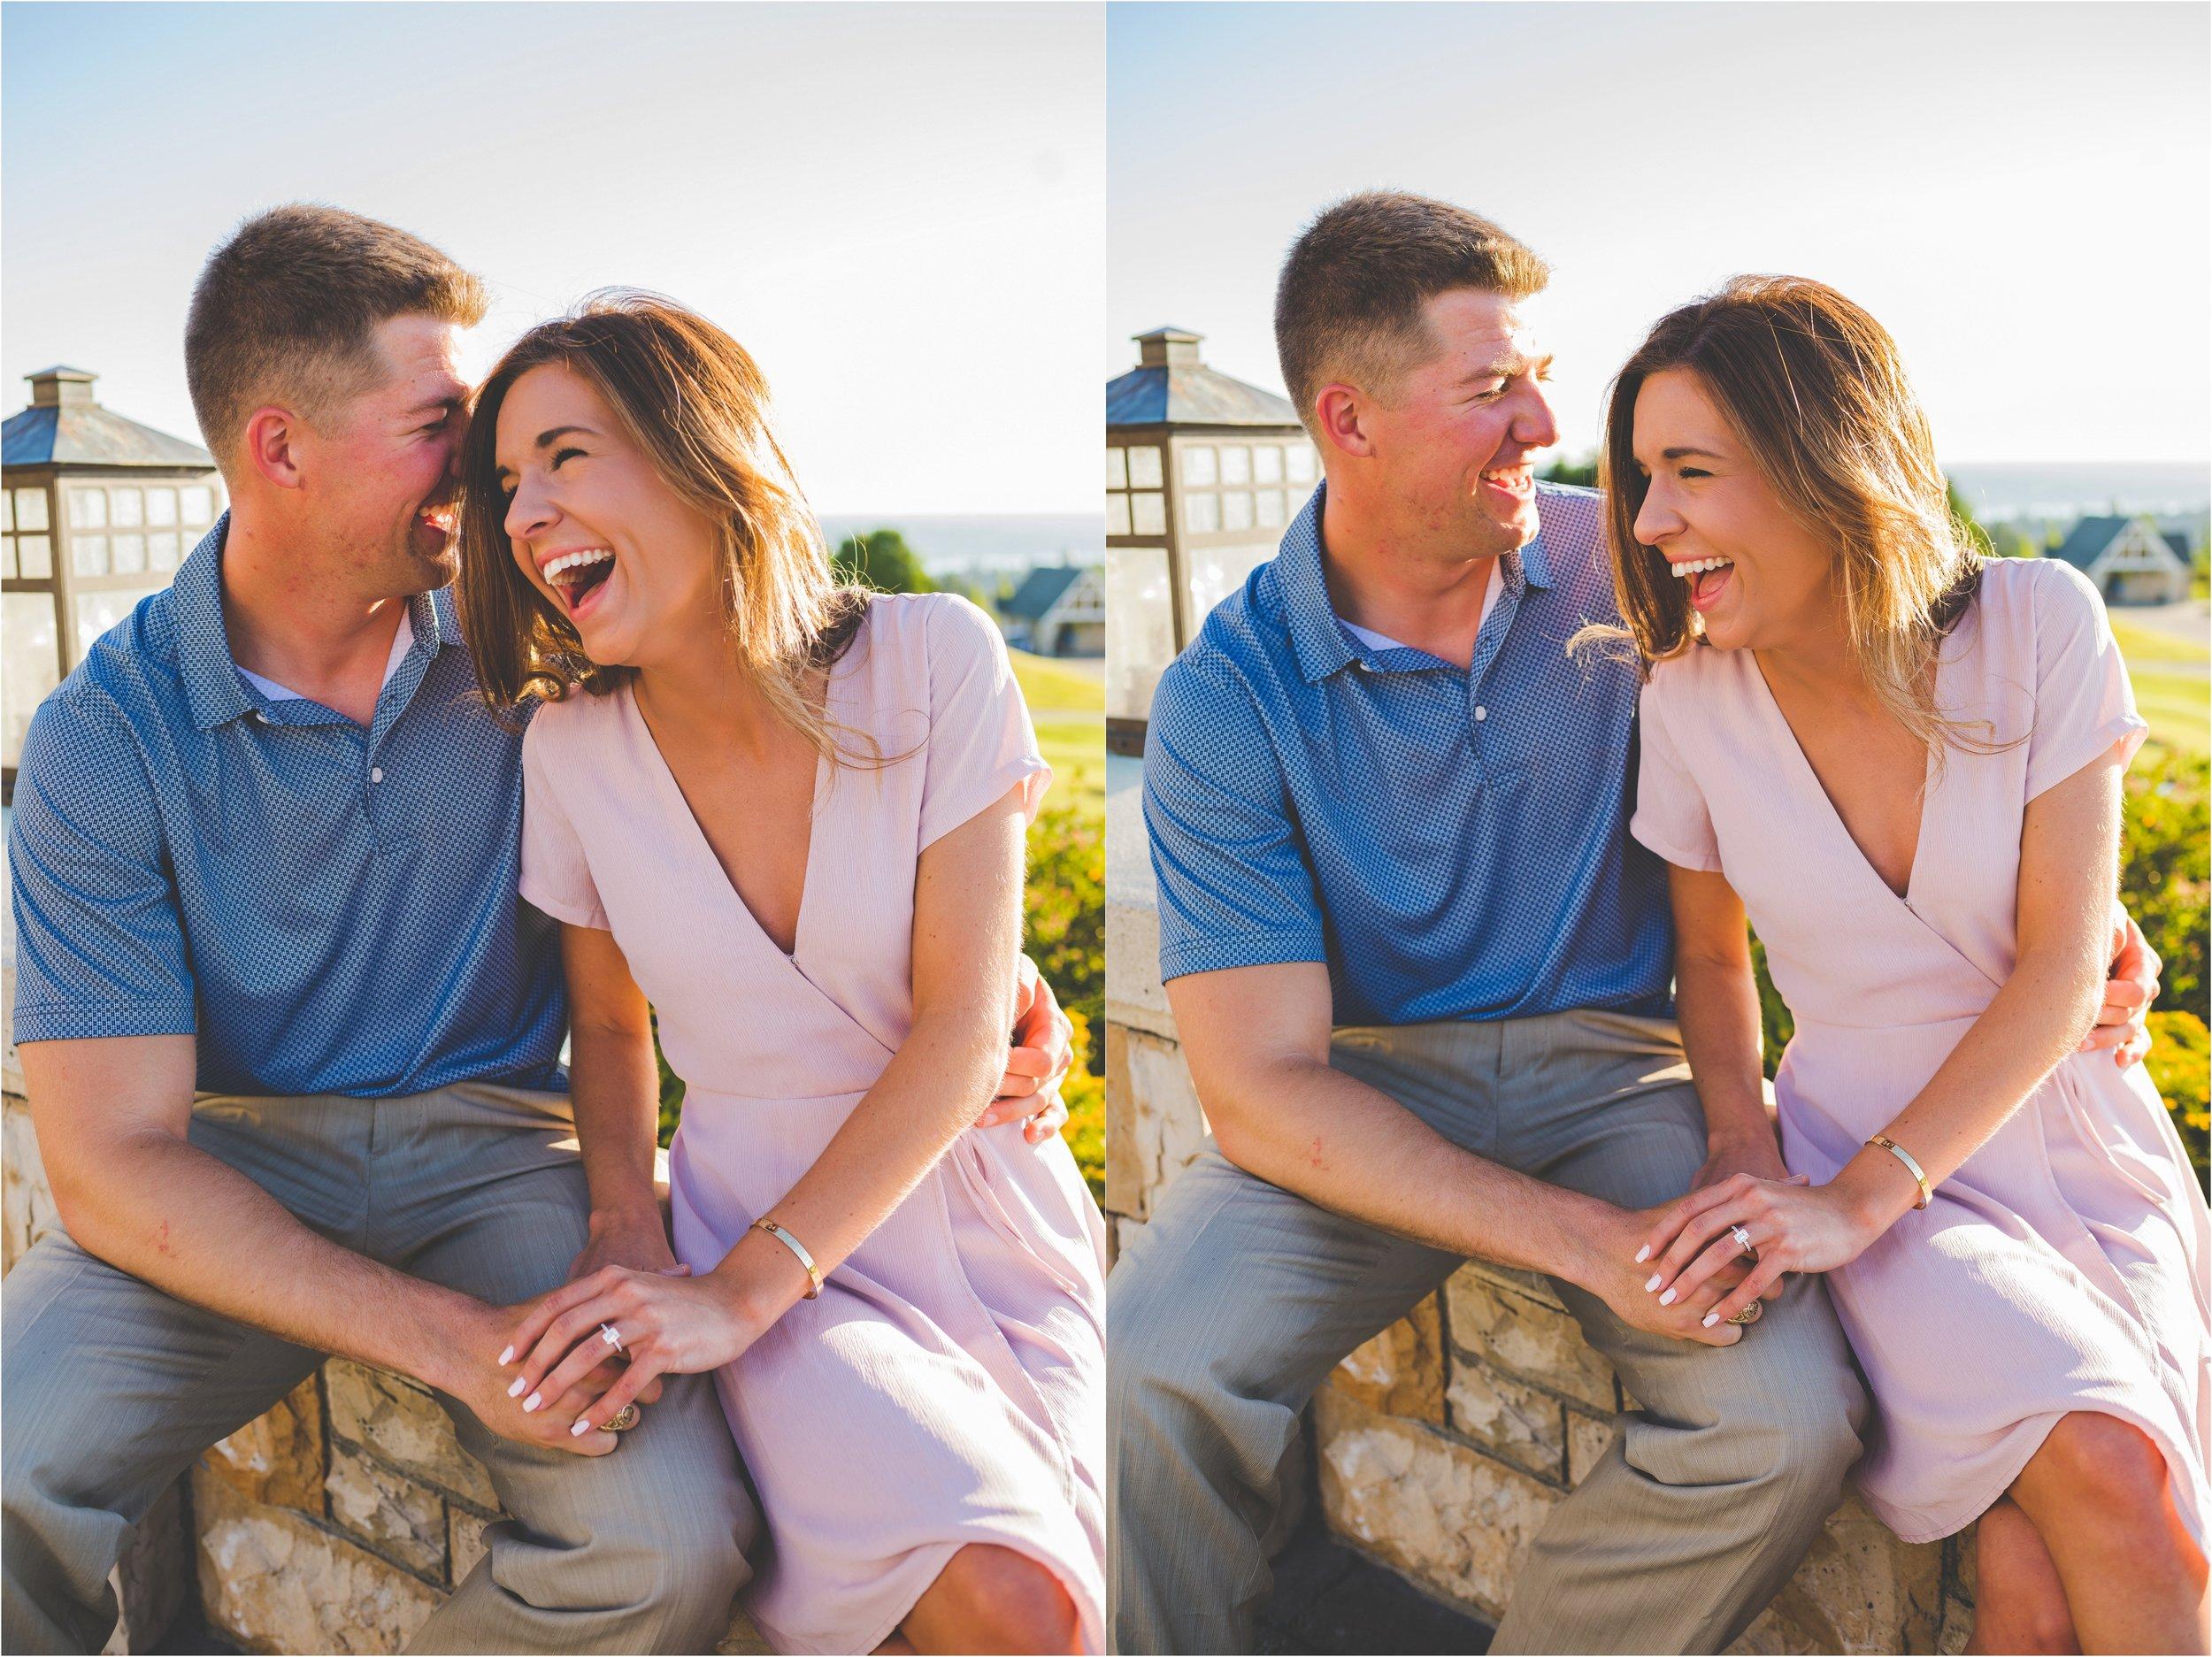 newcastle-golf-club-proposal-jannicka-mayte-seattle-washington-engagement-wedding-photographer_0024.jpg